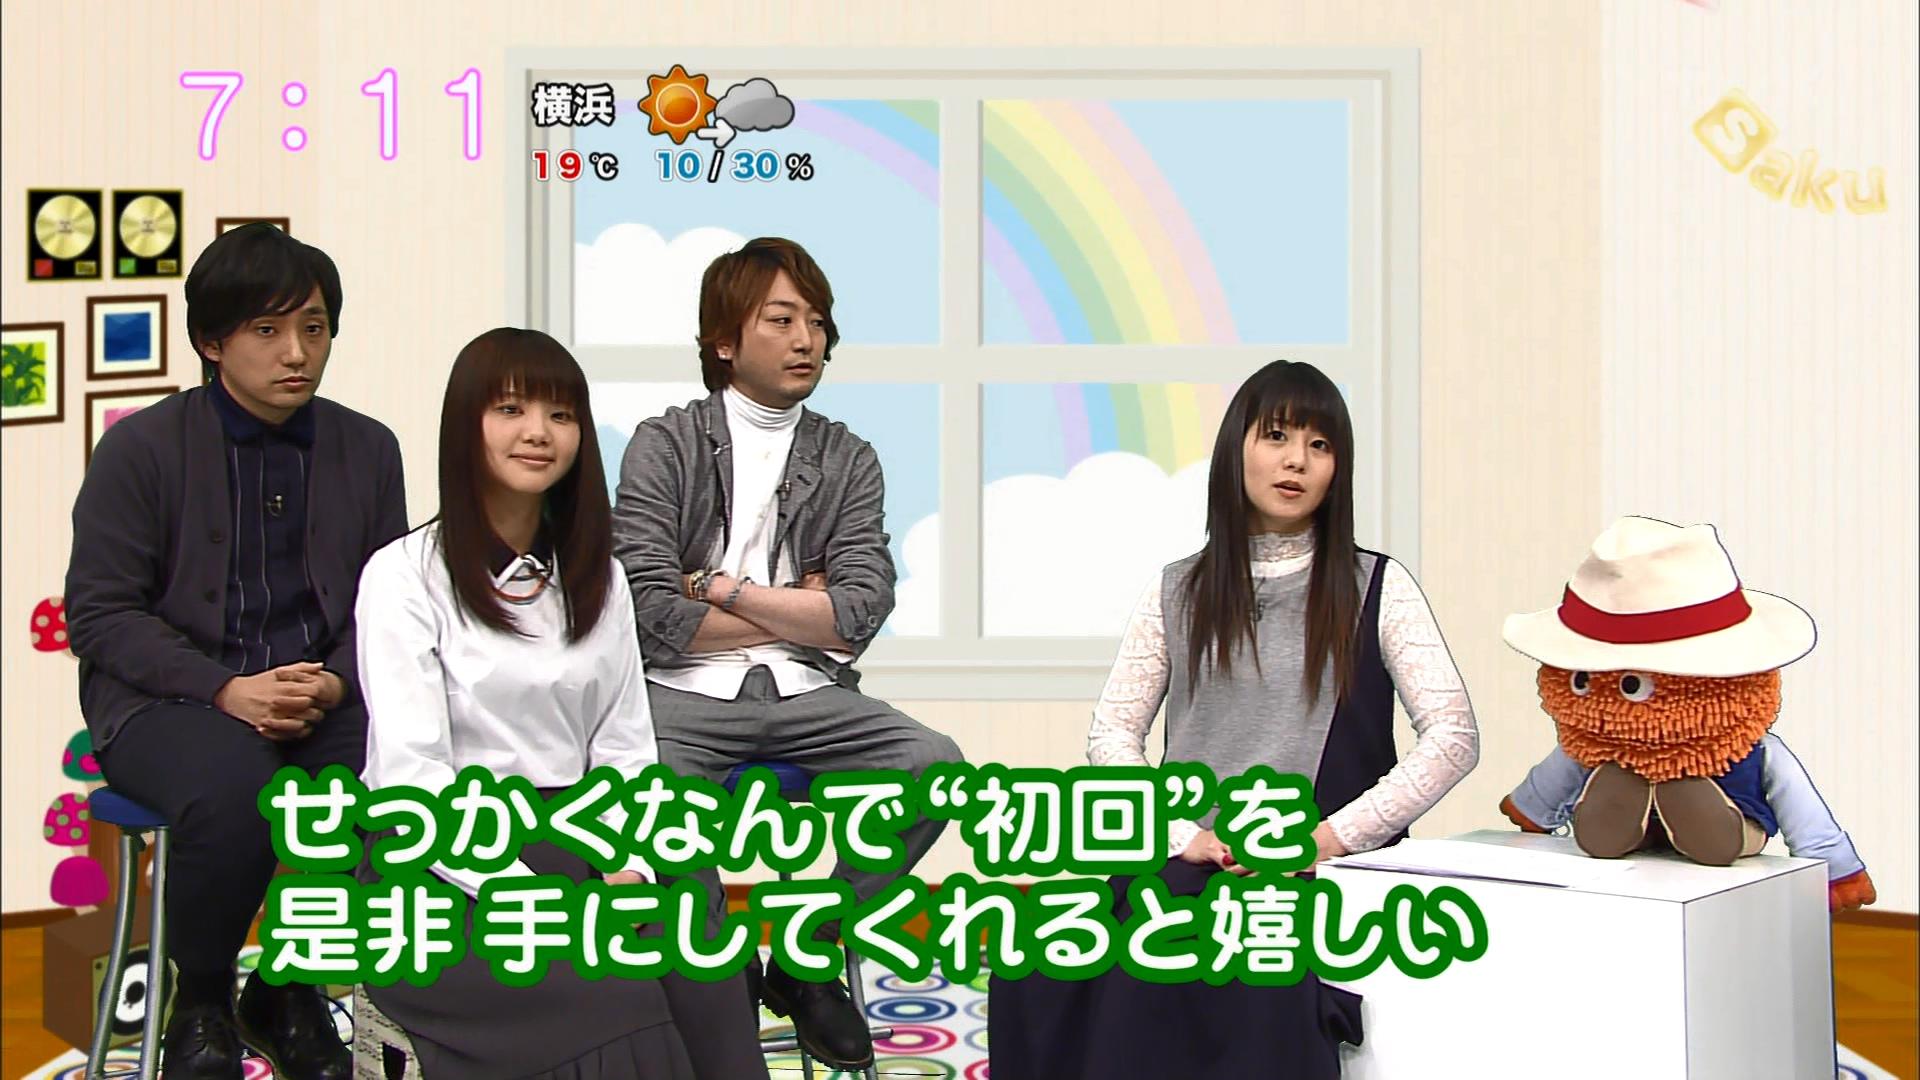 2016.03.18 いきものがかり(saku saku).ts_20160318_102505.129